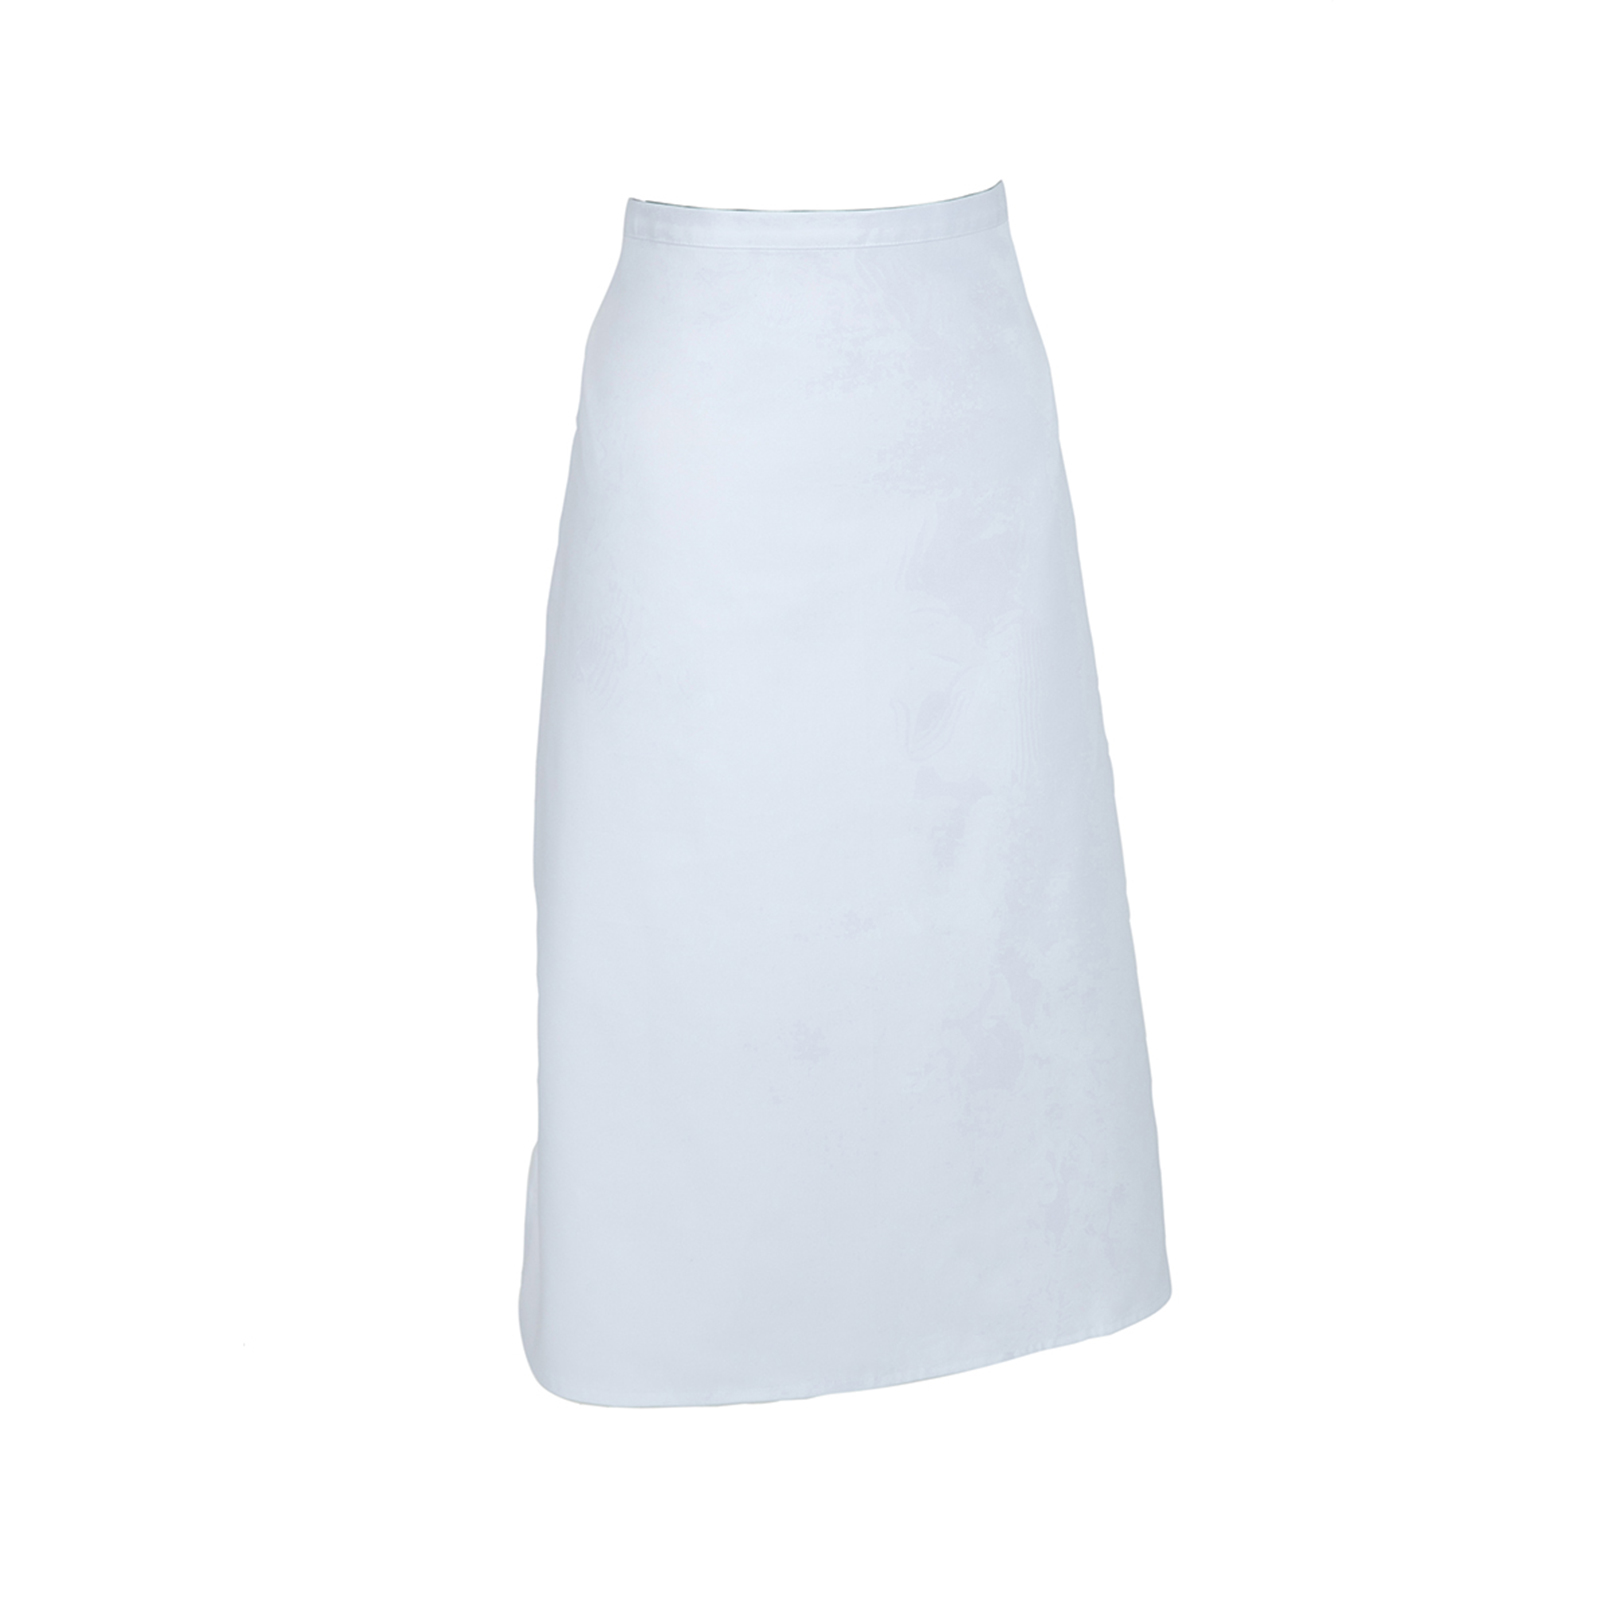 Mercer Culinary M61130WH waist apron